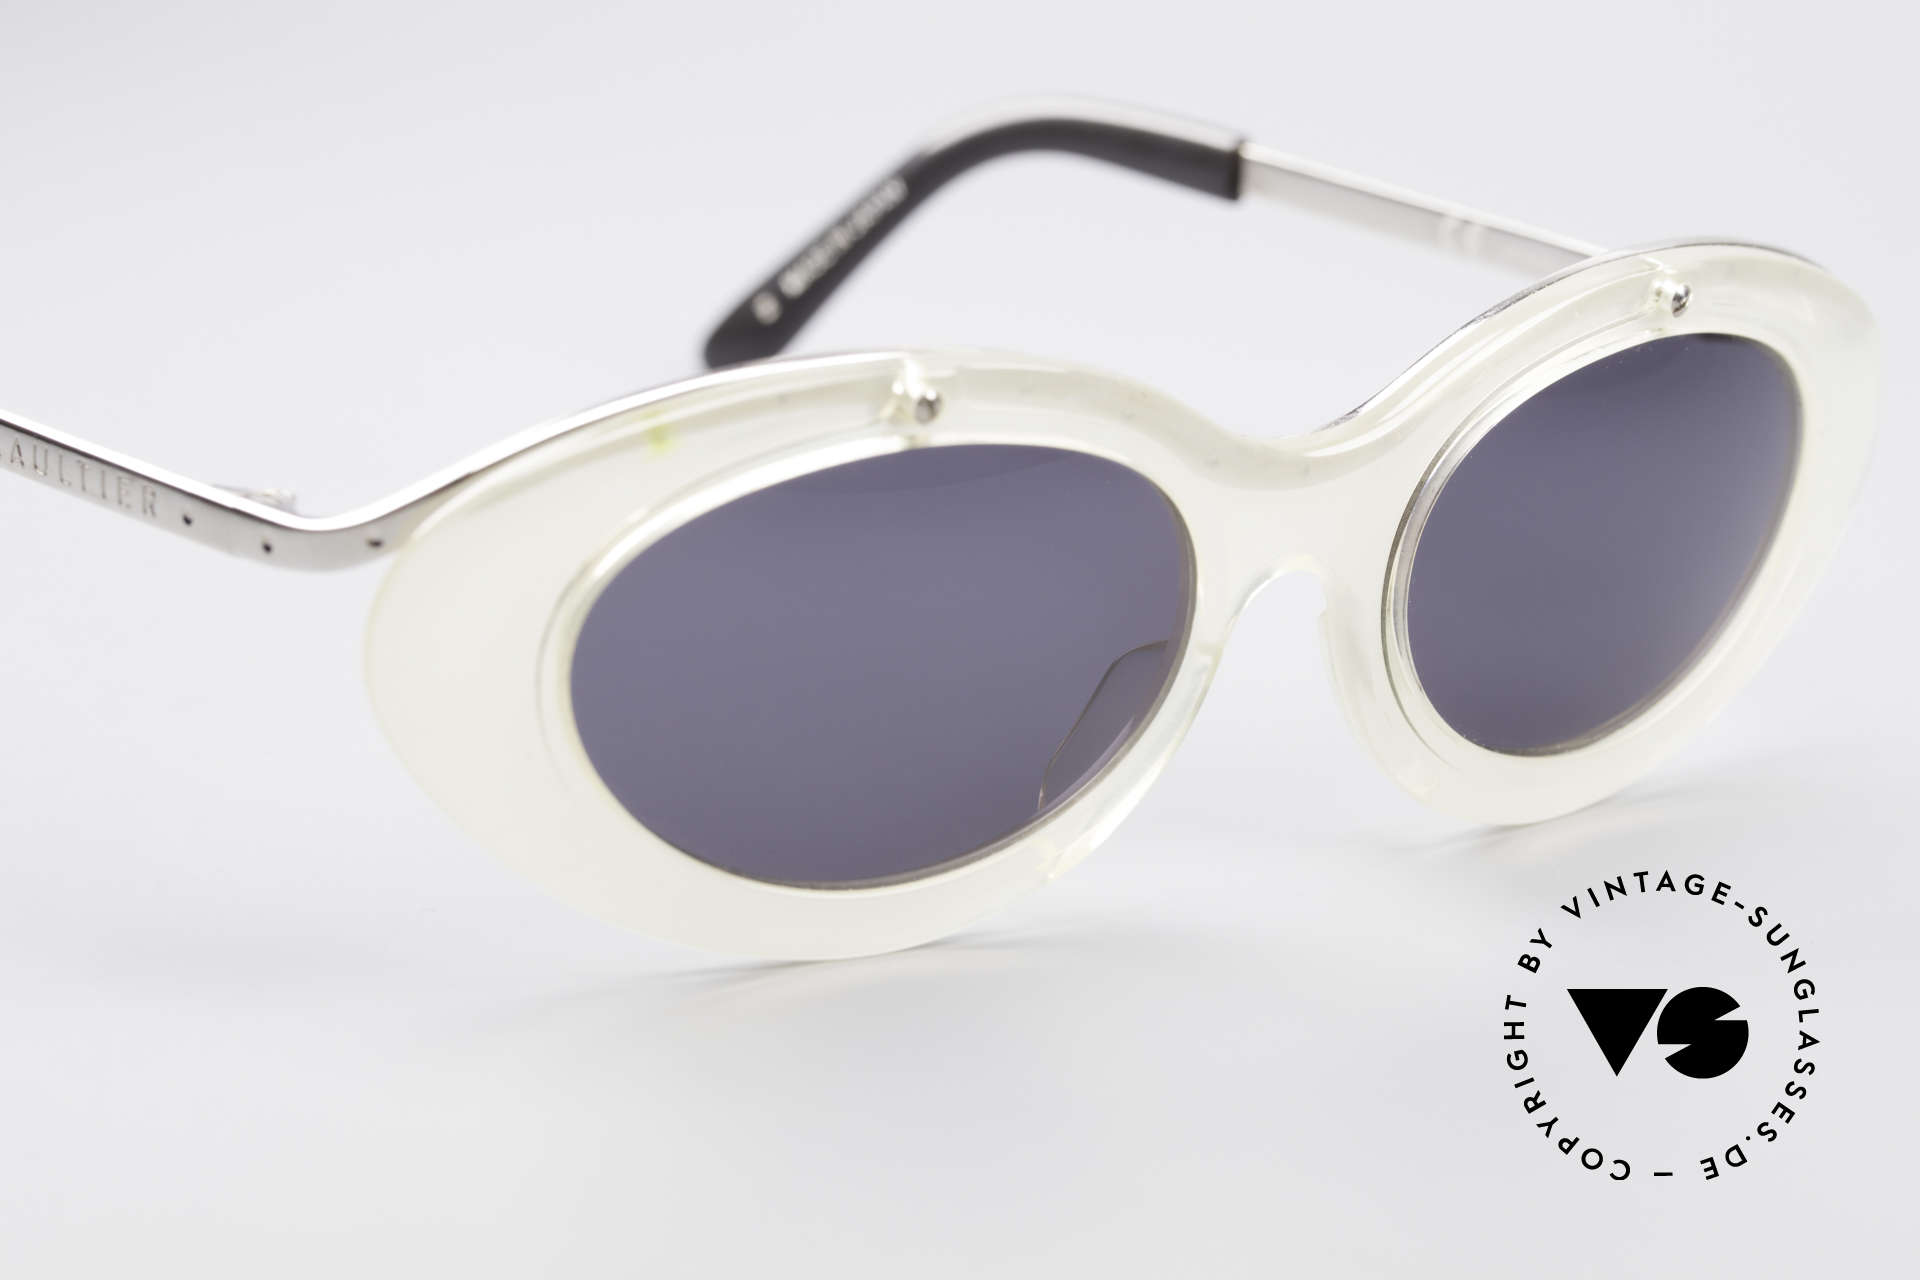 Jean Paul Gaultier 56-7201 Designer Ladies Sunglasses, frame can be glazed with prescriptions / sun lenses, Made for Women